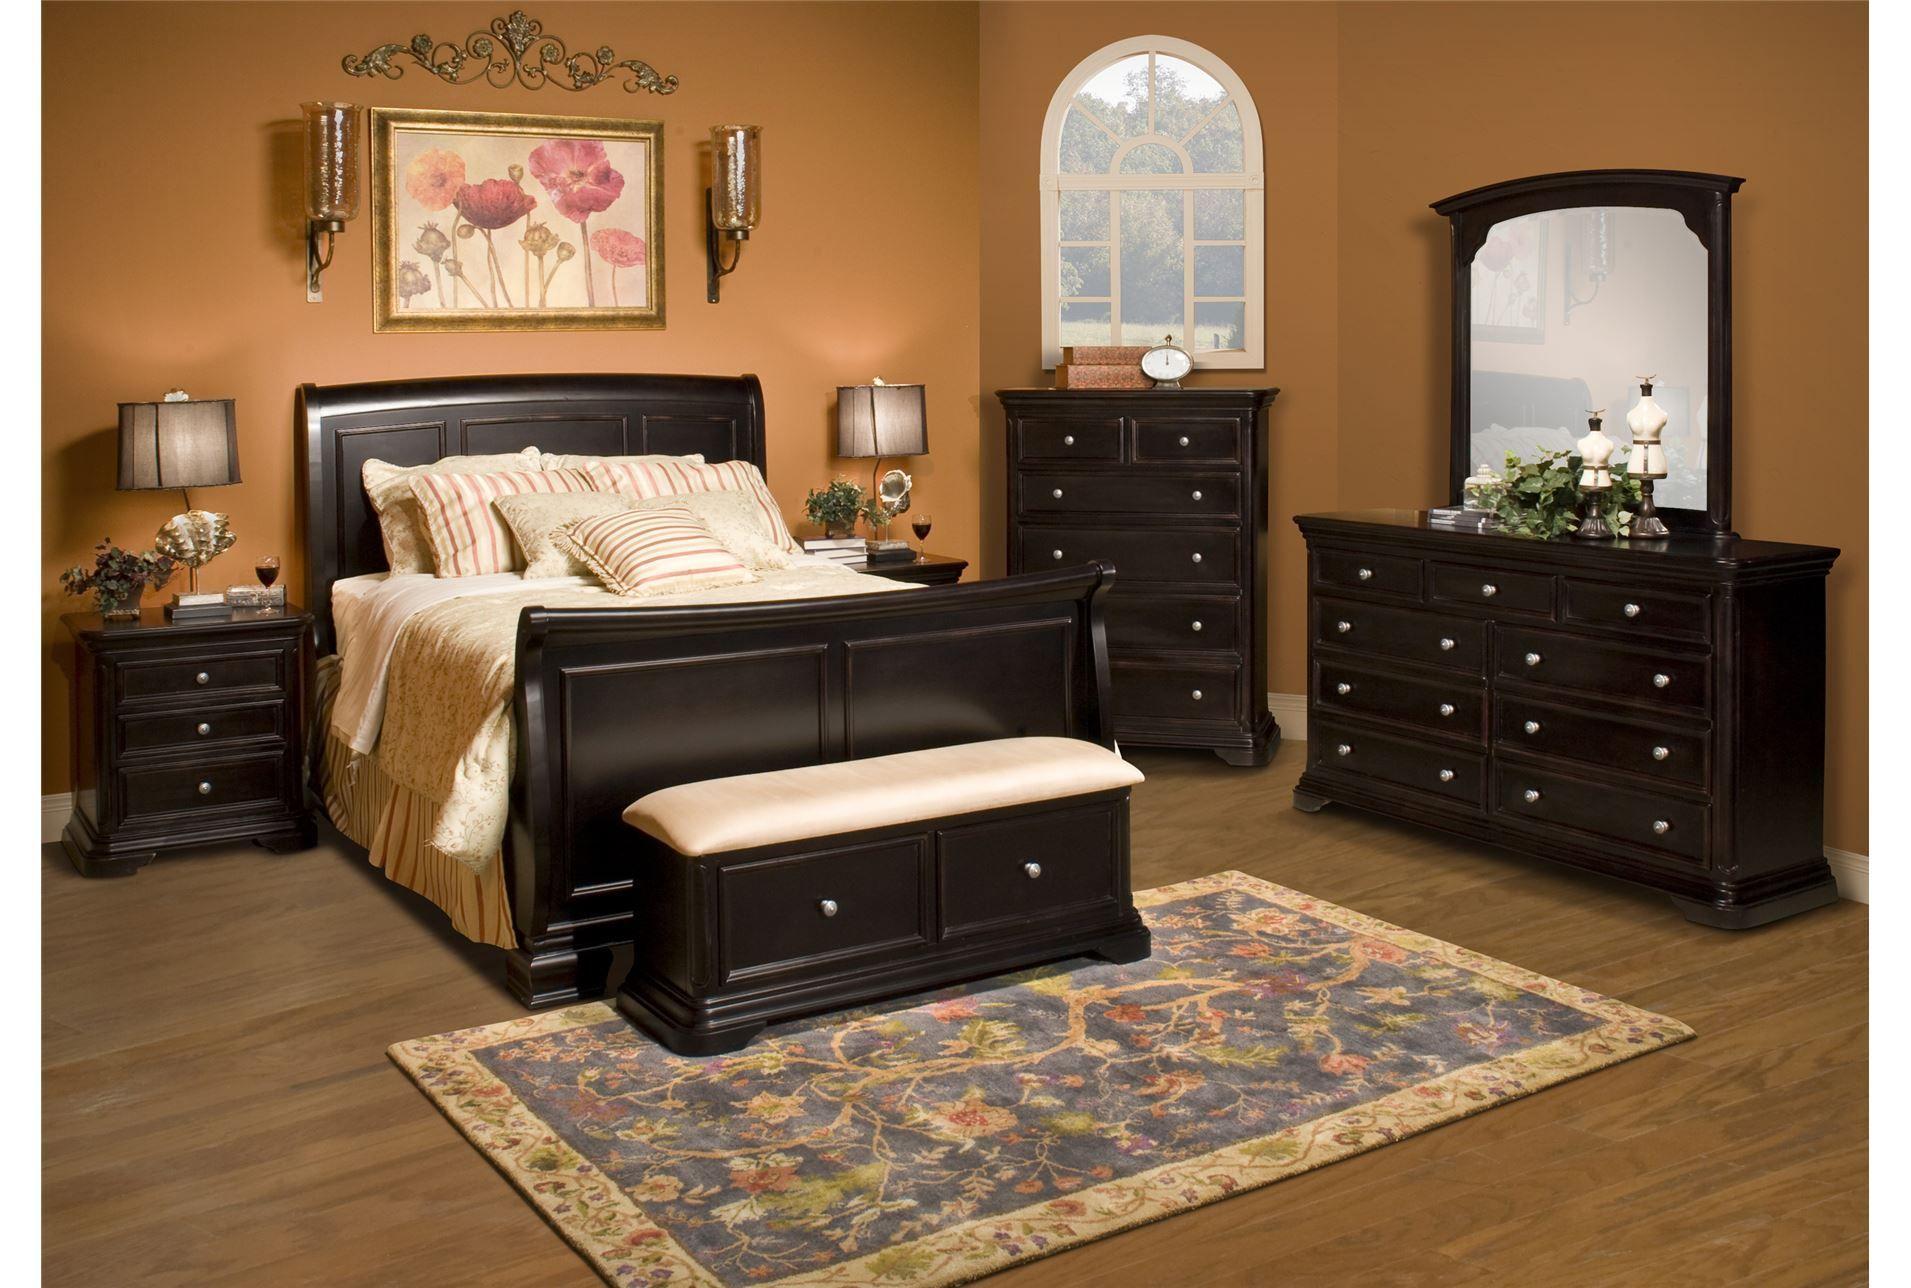 with sets kids furniture inspiration to nebraska templete resume set in setsin bedroom chairs lounge mart elegant